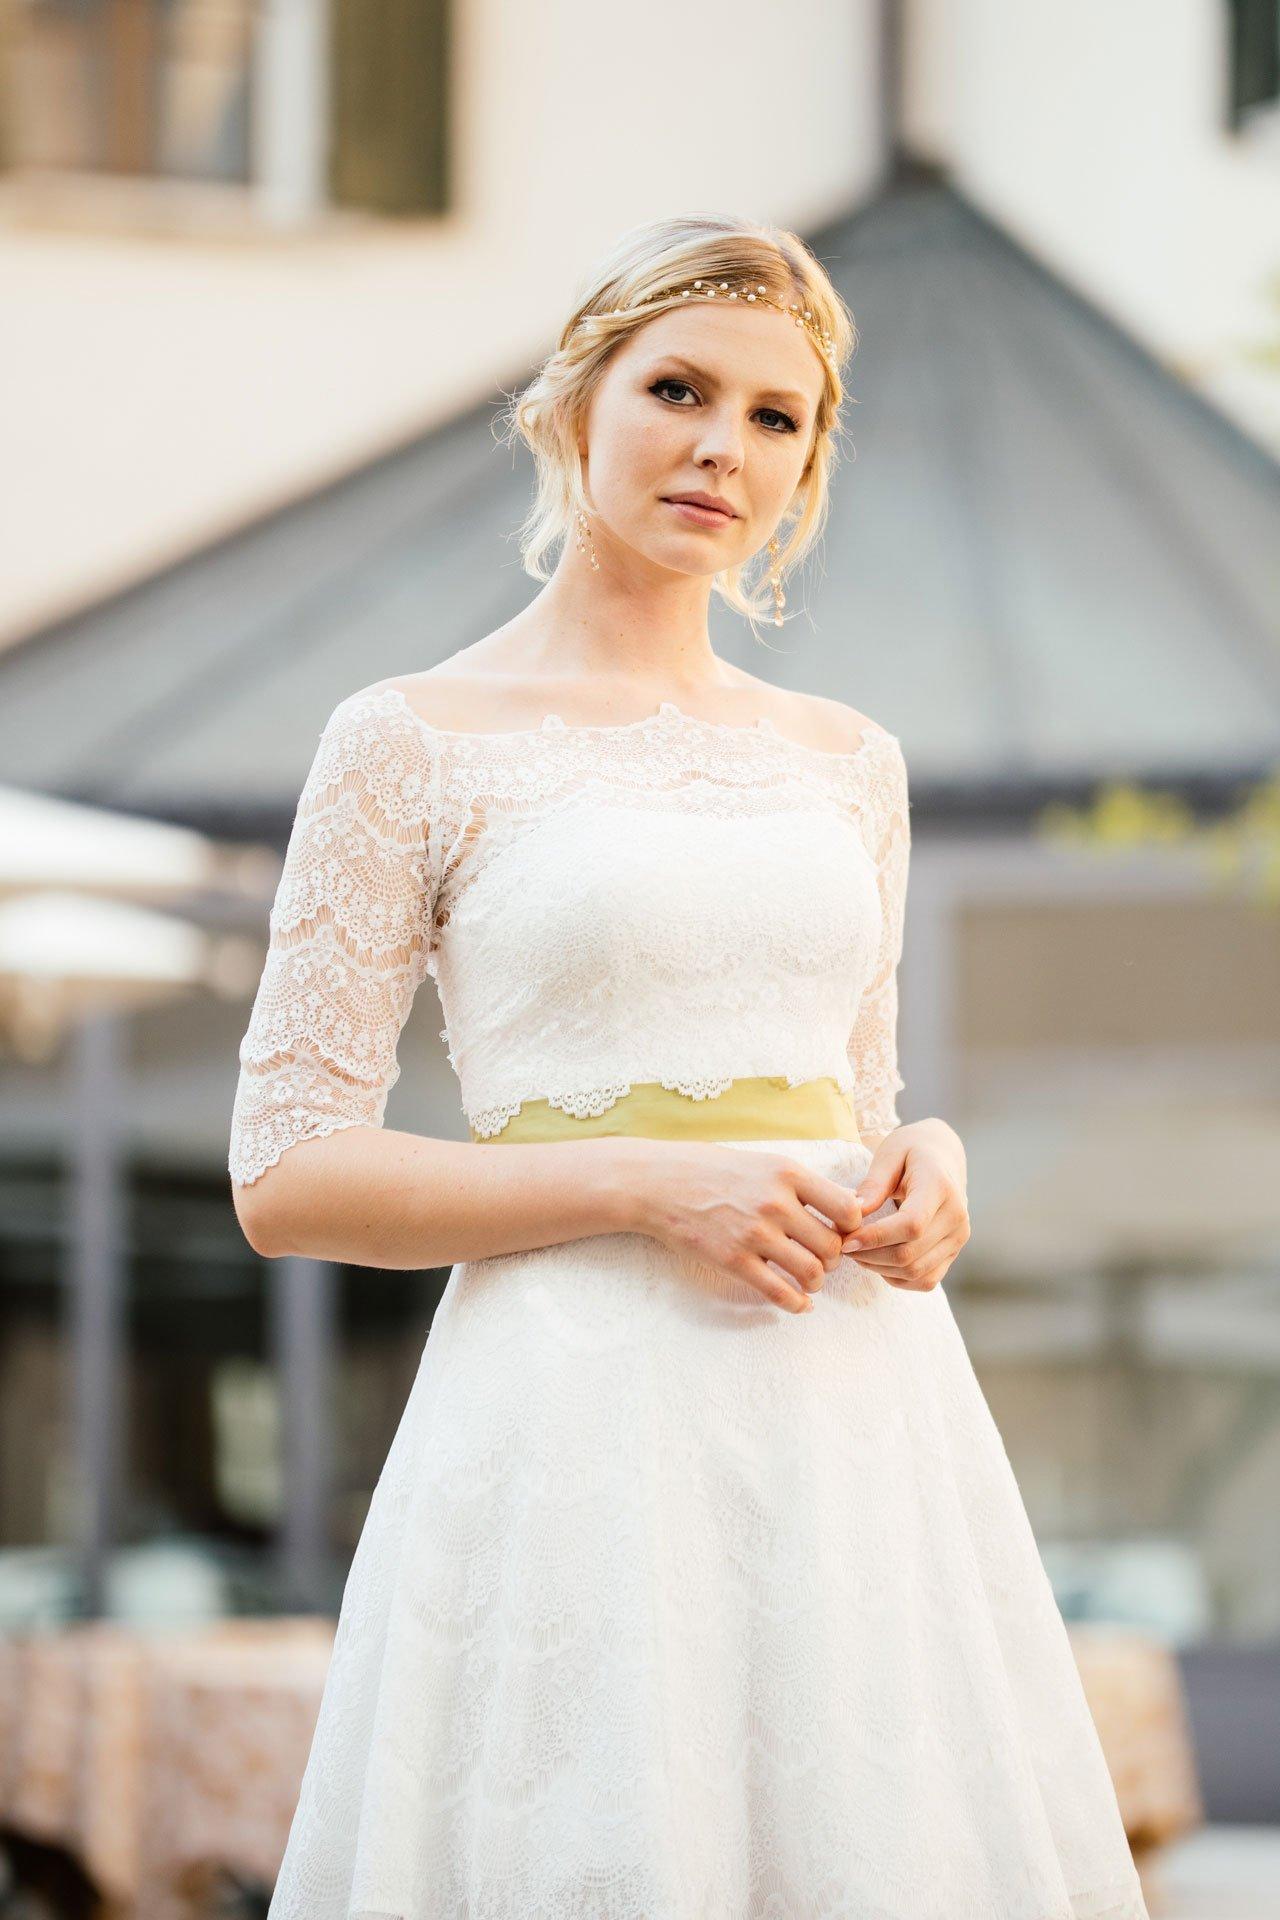 Brautkleid Petticoat kurz Nahaufnahme